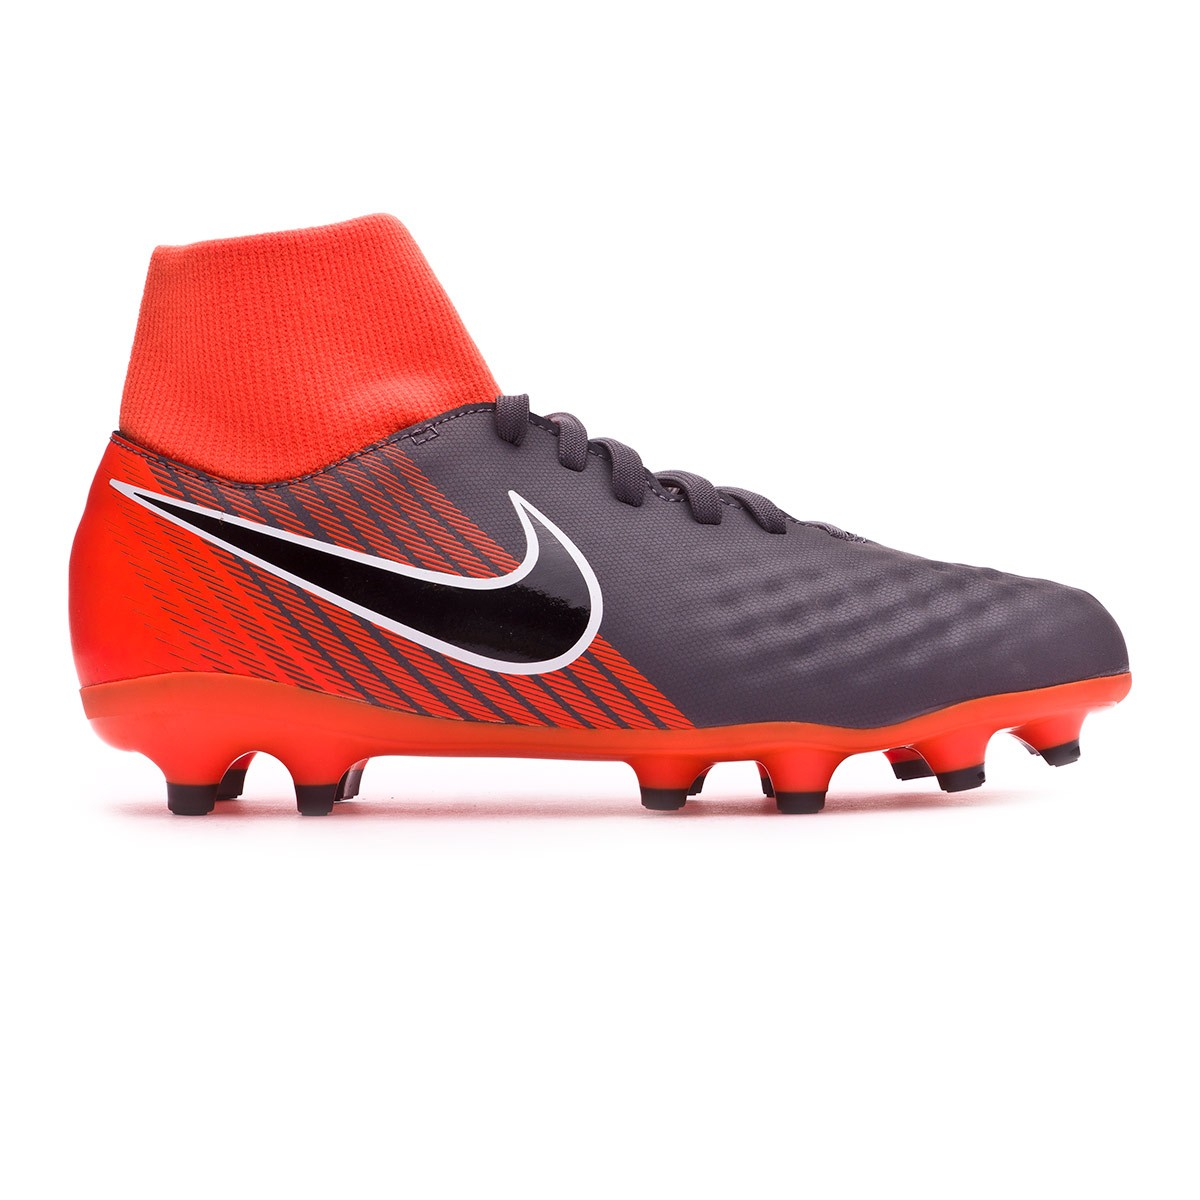 8333f1ae7 Football Boots Nike Kids Magista Obra II Academy DF FG Dark  grey-Black-Total orange-White - Tienda de fútbol Fútbol Emotion